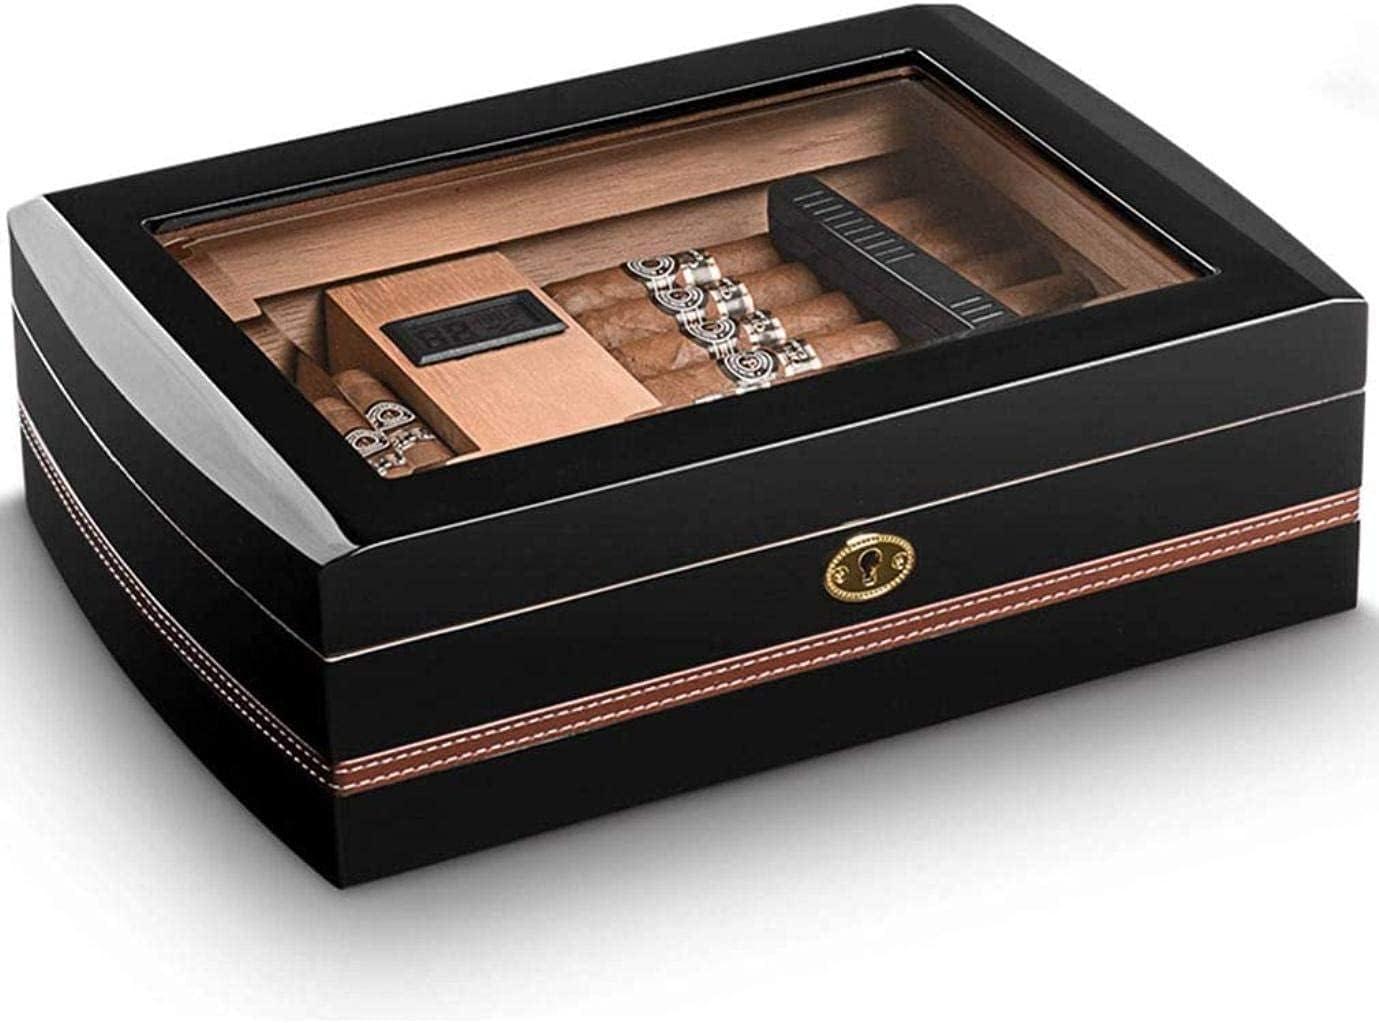 ZHJBD Smoking Set Cigar Accessories Humidor Mesa Mall Box Glass Tampa Mall Top